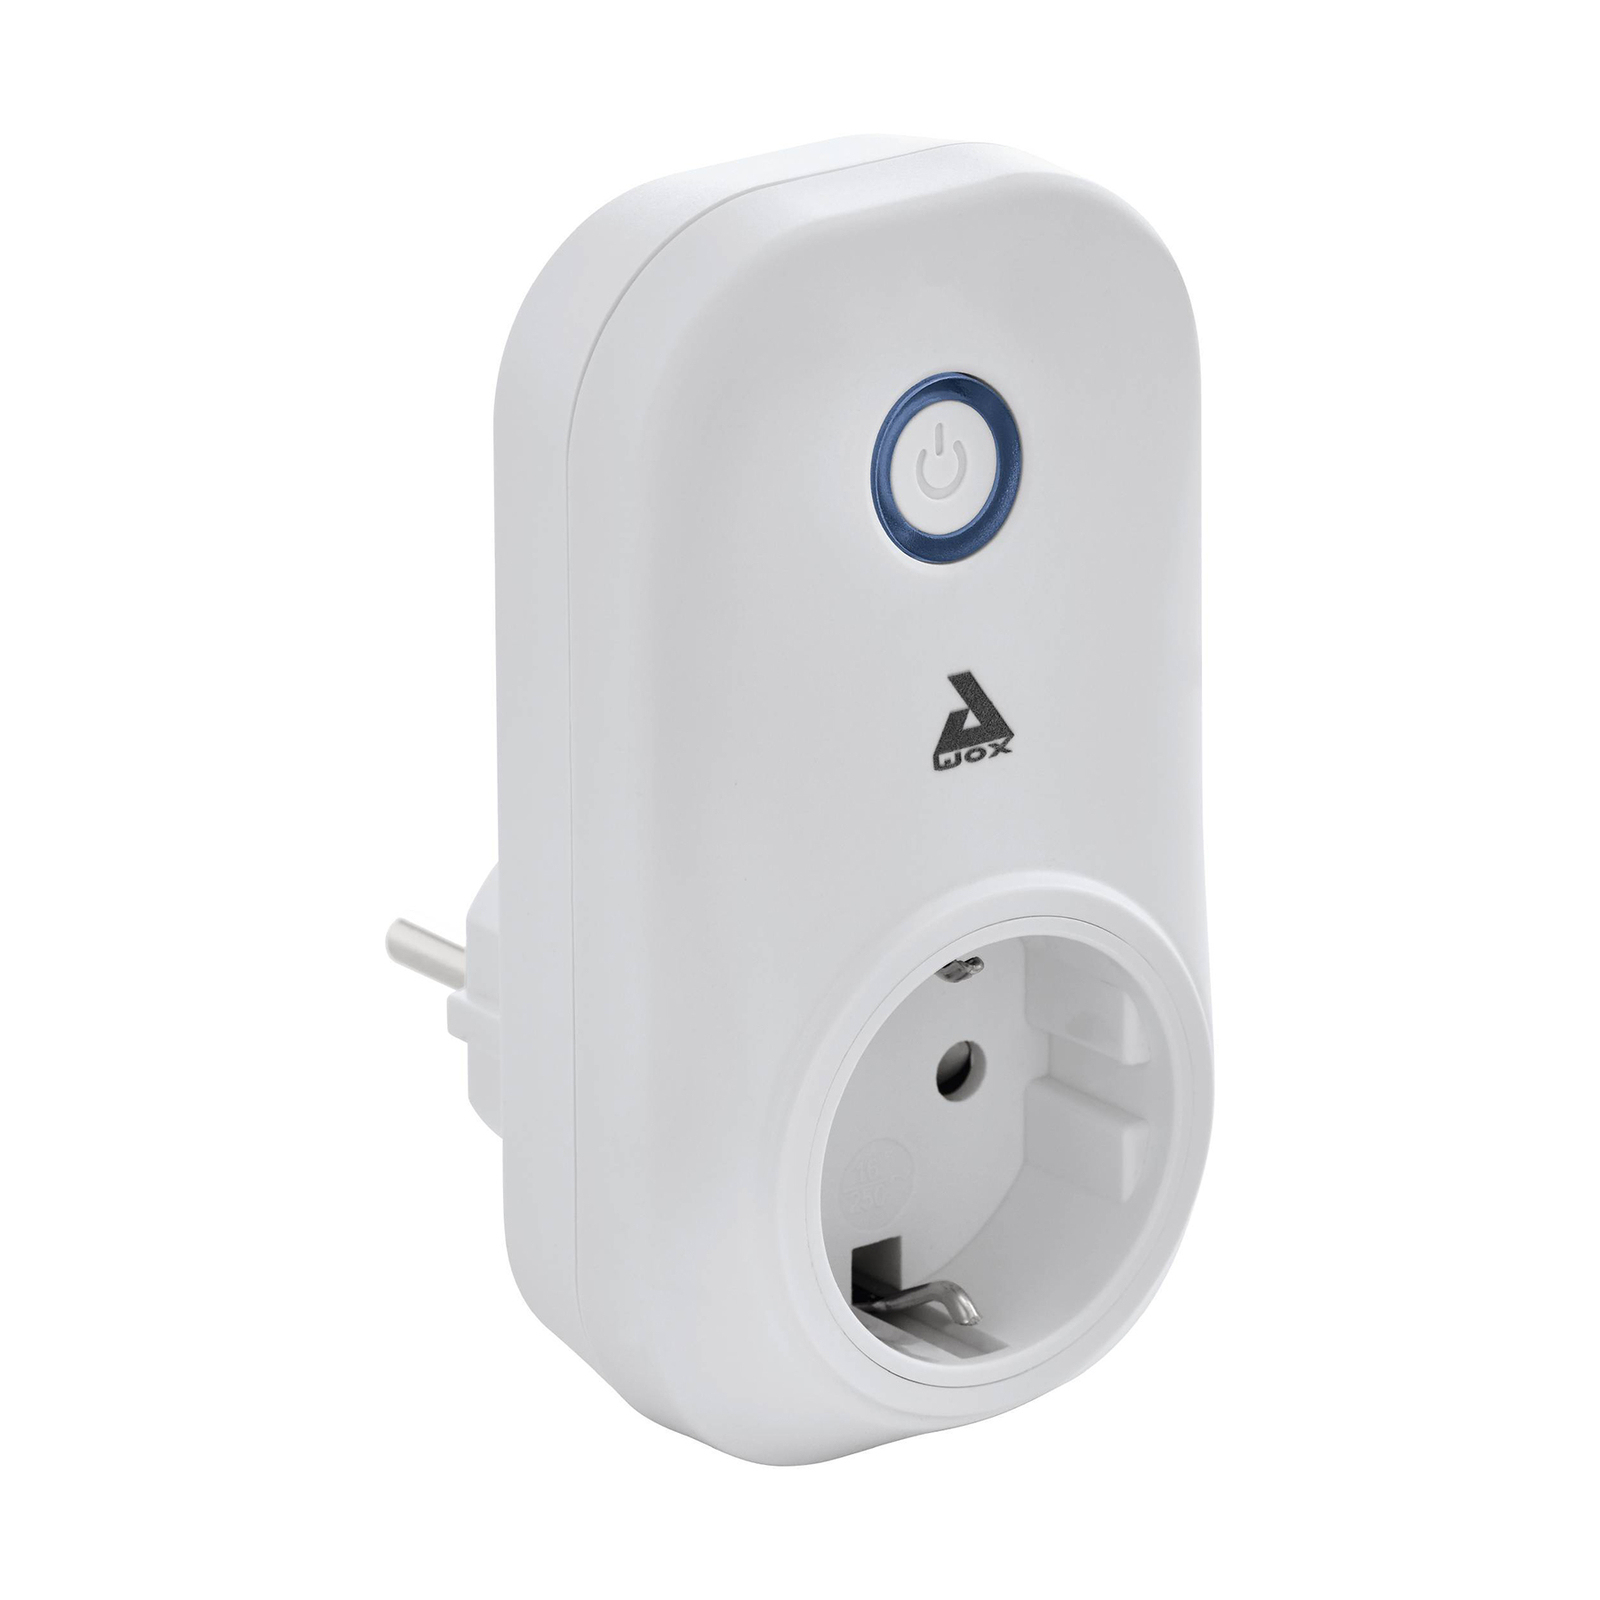 EGLO connect Plug Bluetooth-Steckdose